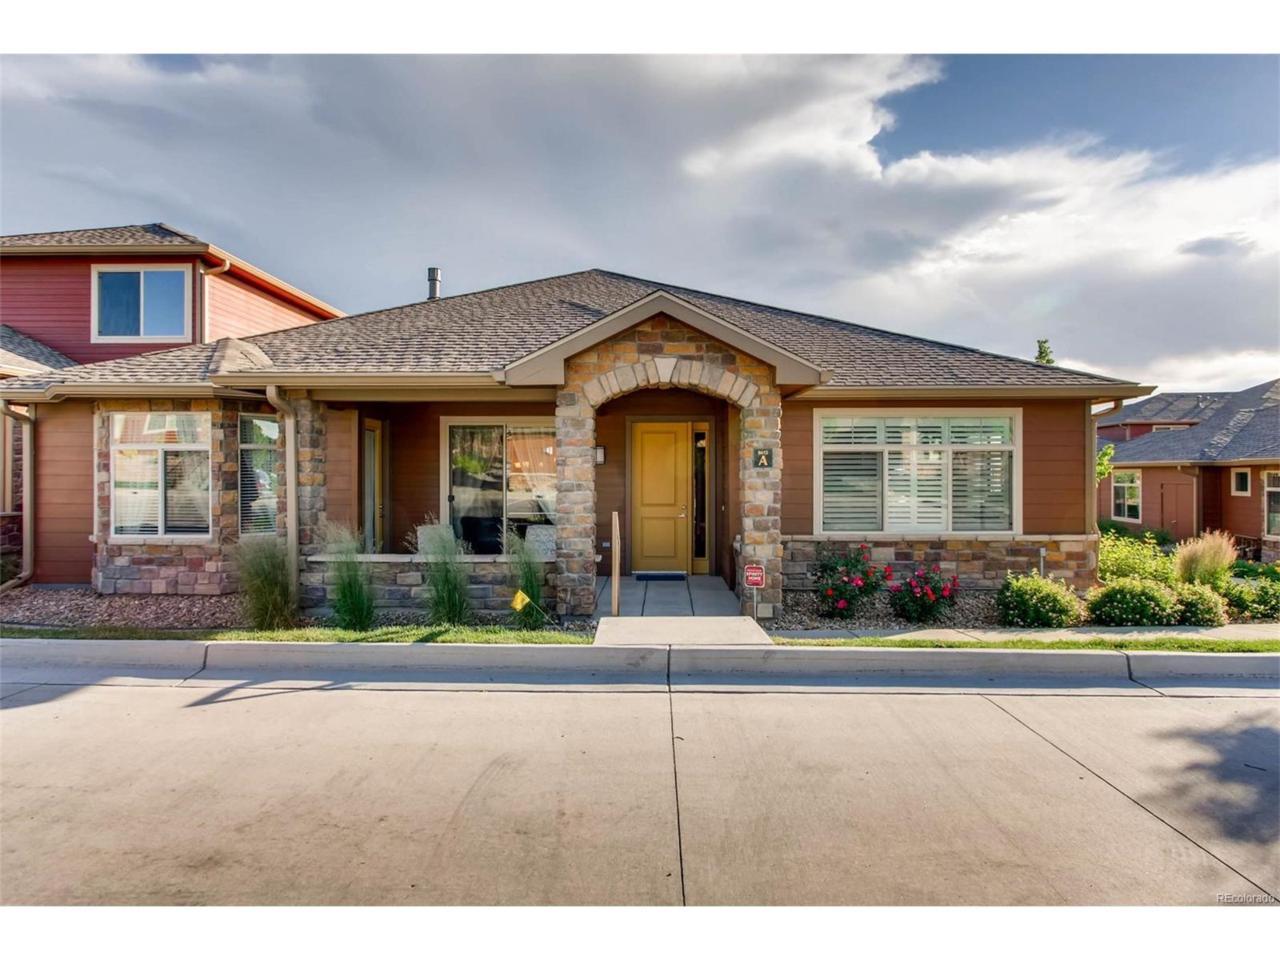 8615 Gold Peak Place A, Highlands Ranch, CO 80130 (MLS #2231779) :: 8z Real Estate